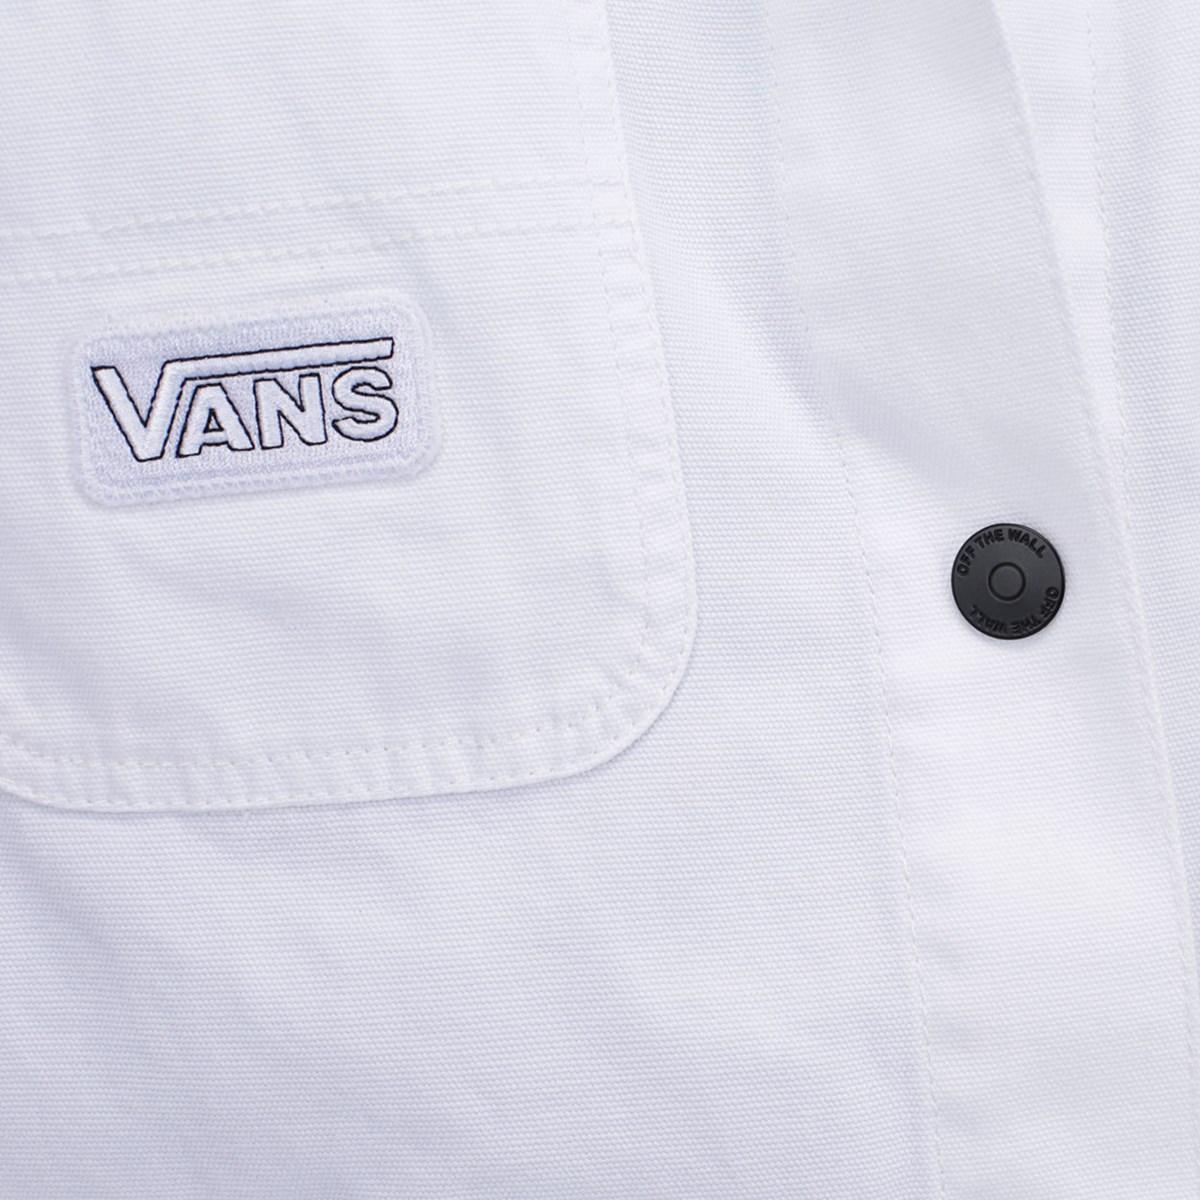 Jaqueta Vans Make Me Your Own White VN0A4V42WHT